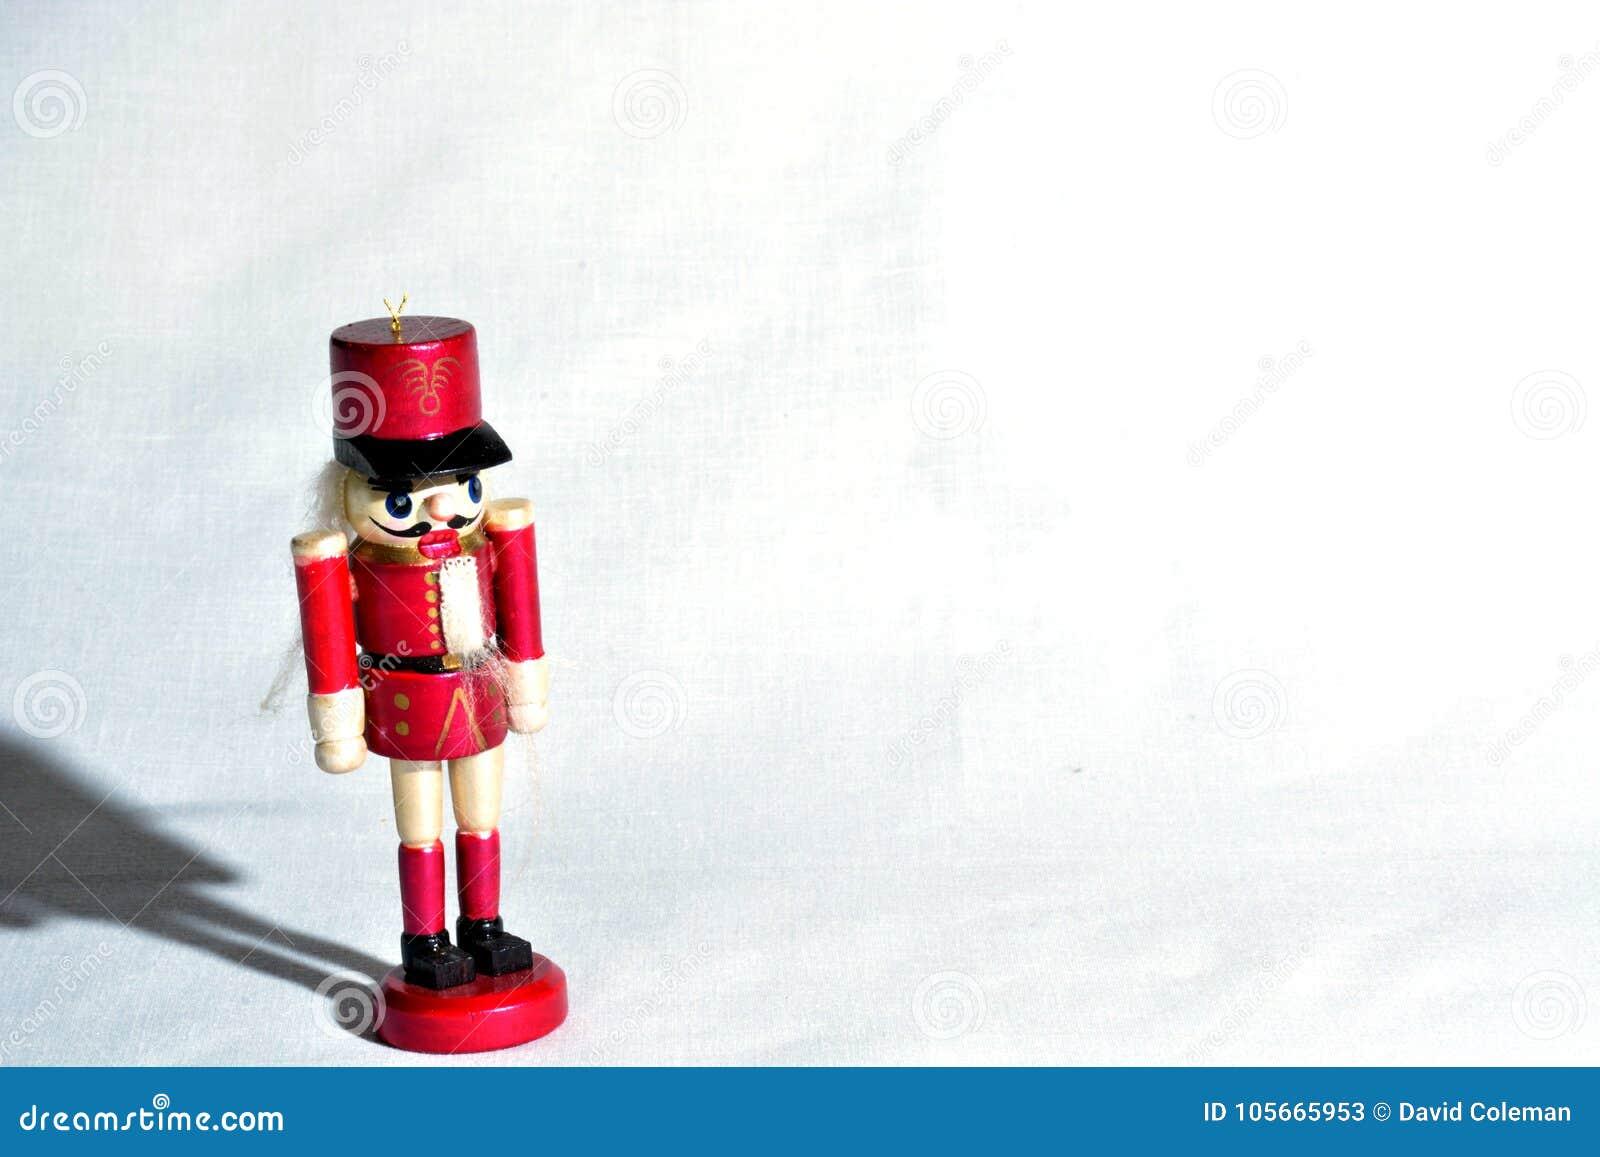 Red Nutcracker Christmas Decoration Stock Image - Image of figurine ...